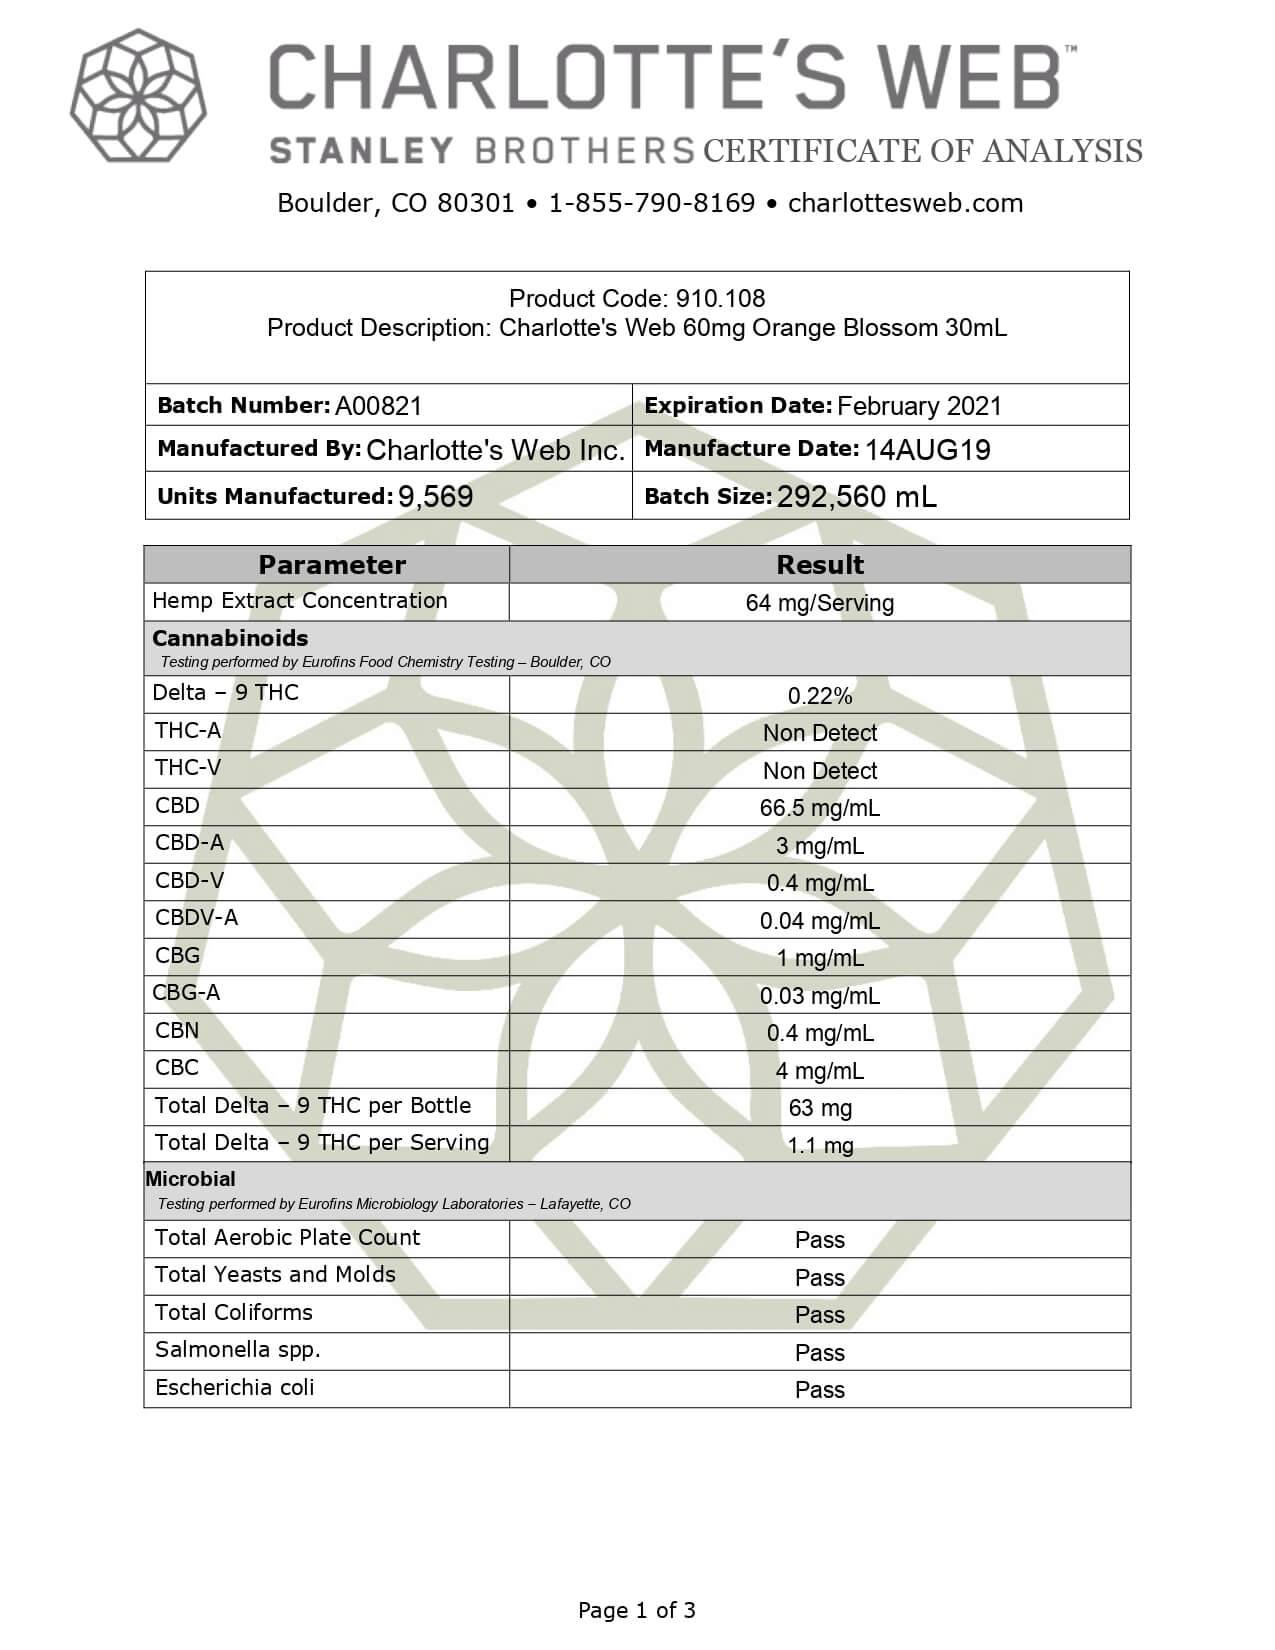 Charlottes Web Full Spectrum Orange Blossom 60mg 1ml Lab Report